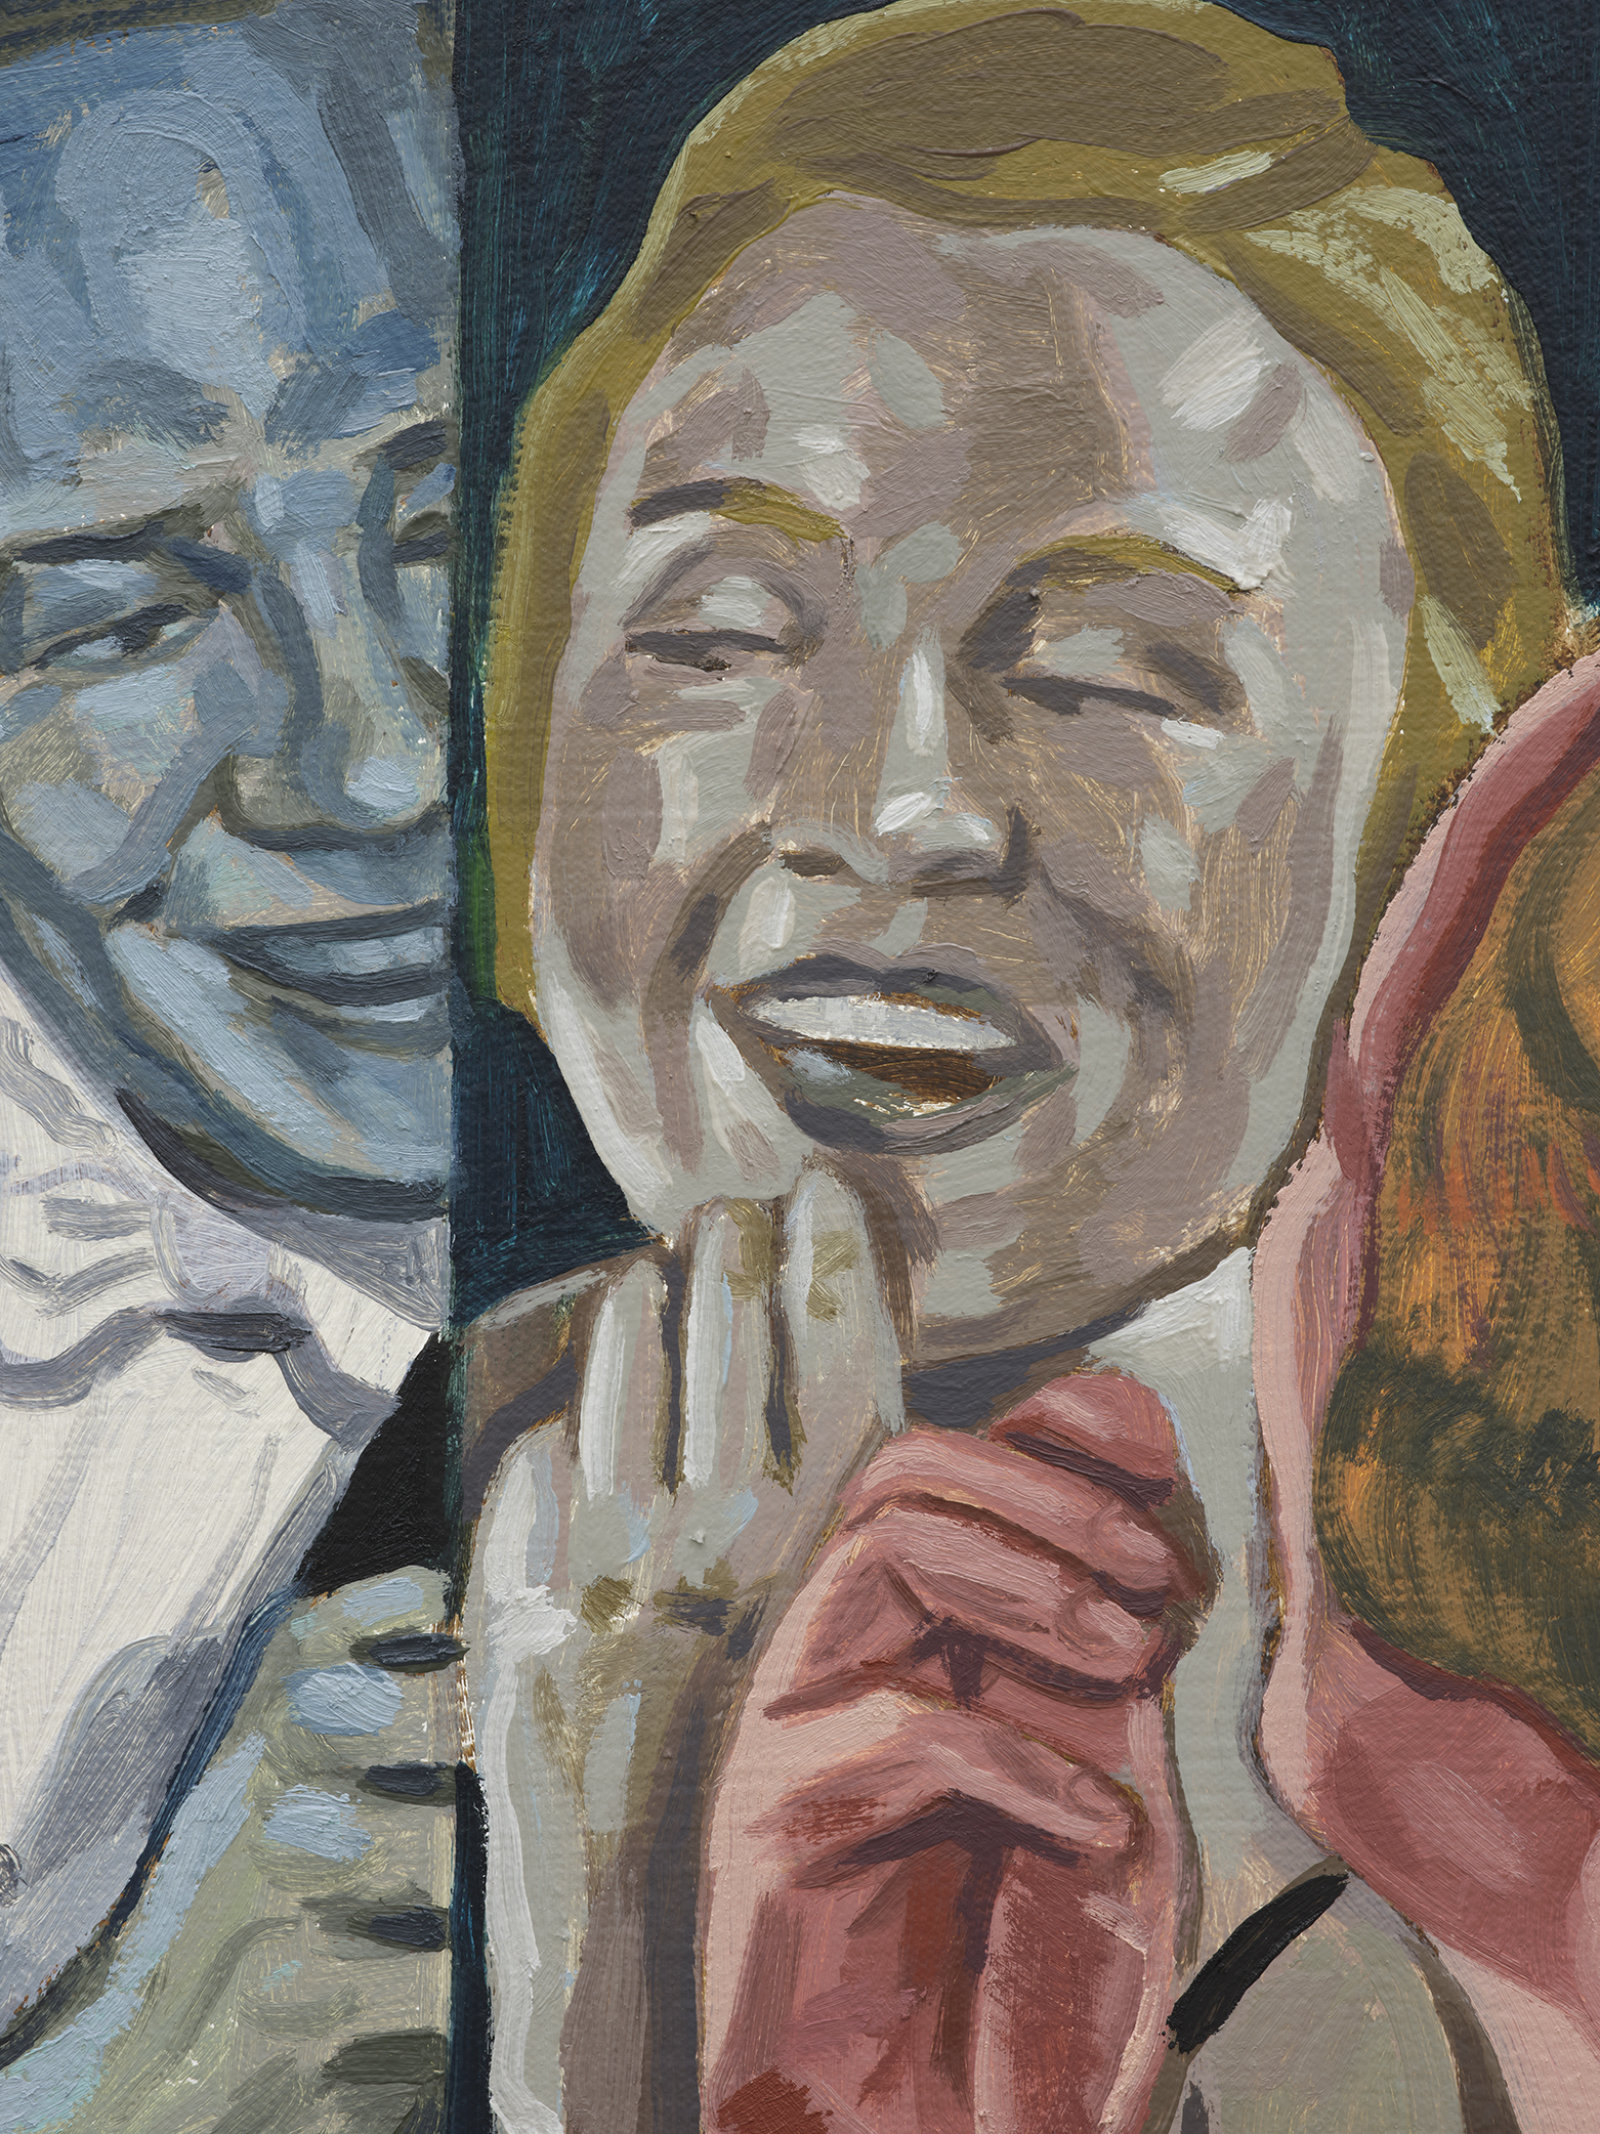 Damian Moppett, Man and Woman in Mirror (detail), 2020, oil on canvas, 36 x 31 in. (92 x 79 cm) by Damian Moppett